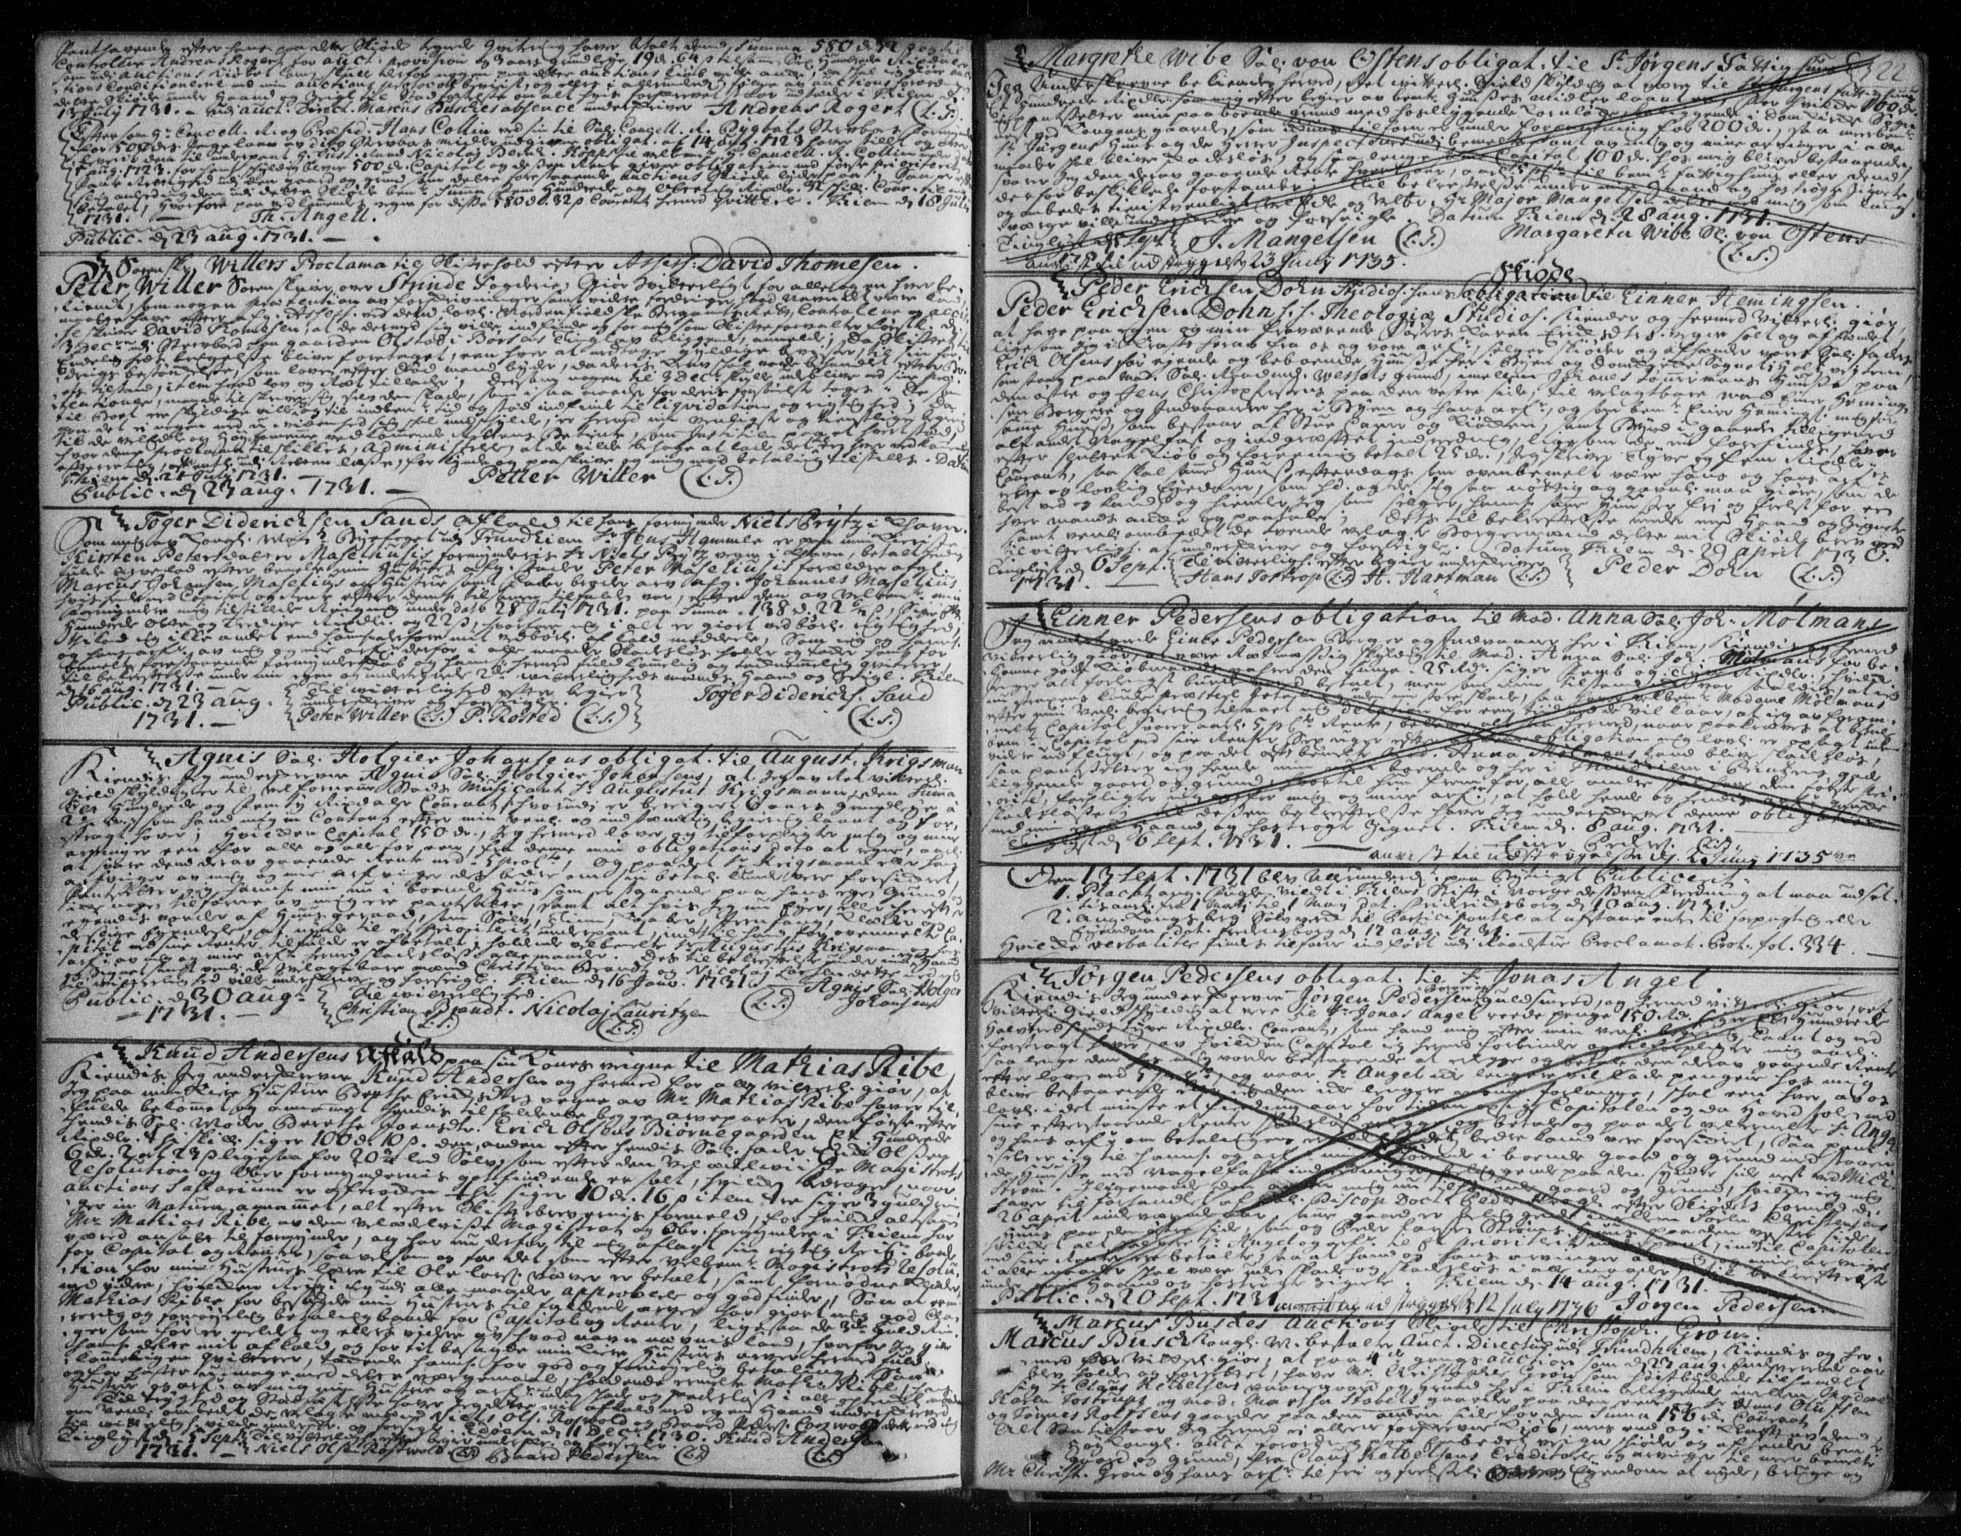 SAT, Trondheim byfogd, 2/2C/L0006: Mortgage book no. 4, 1720-1733, p. 322